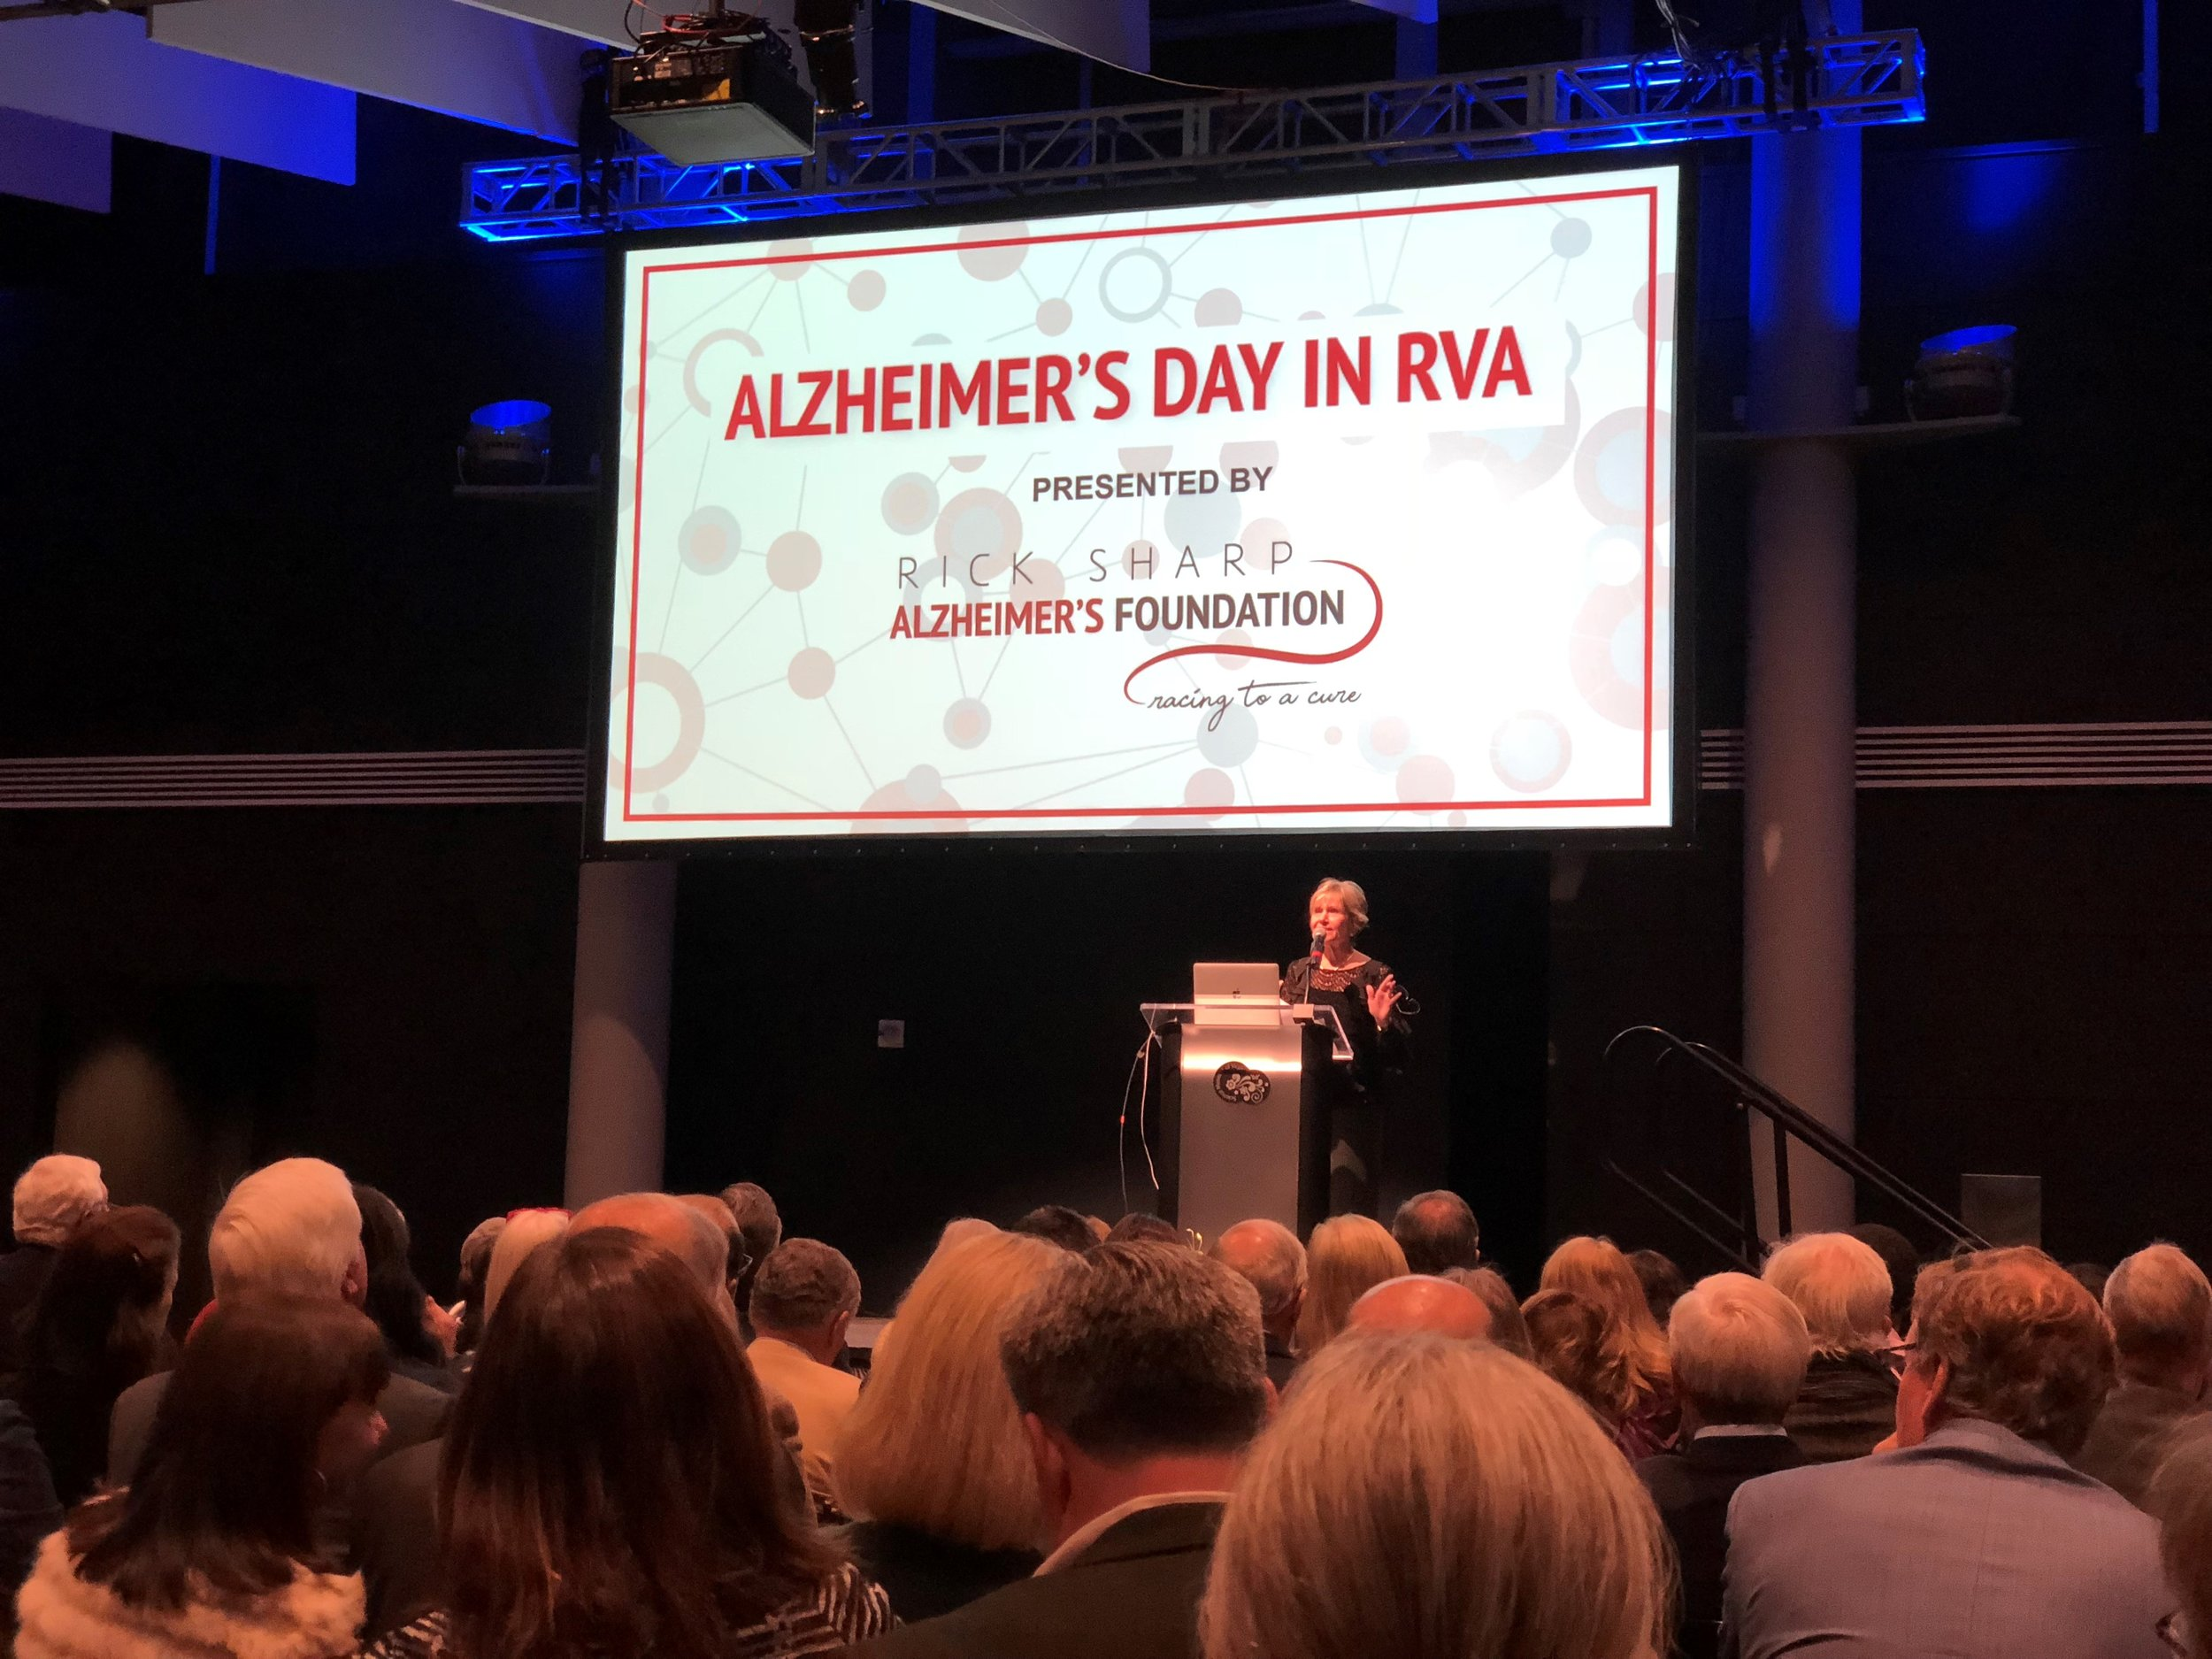 Sherry Sharp, founder of Rick Sharp Alzheimer's Foundation